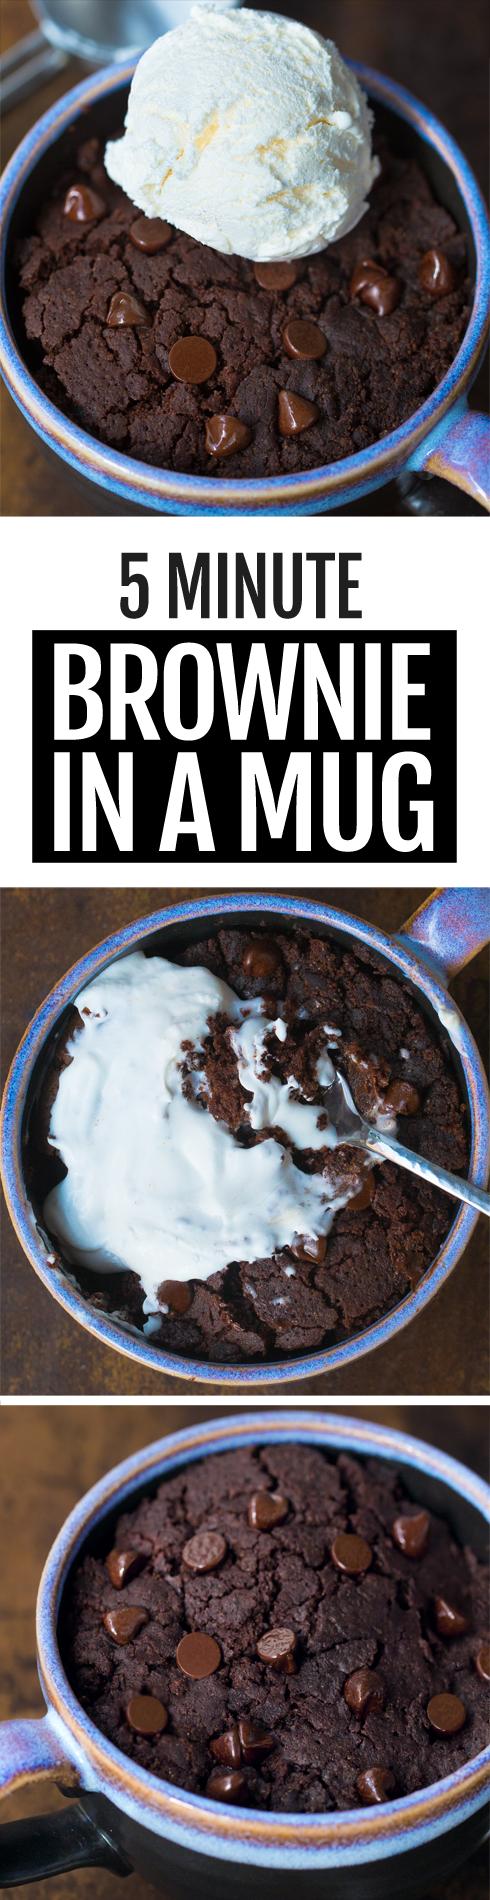 Easy Brownie In A Mug, a single serving chocolate recipe